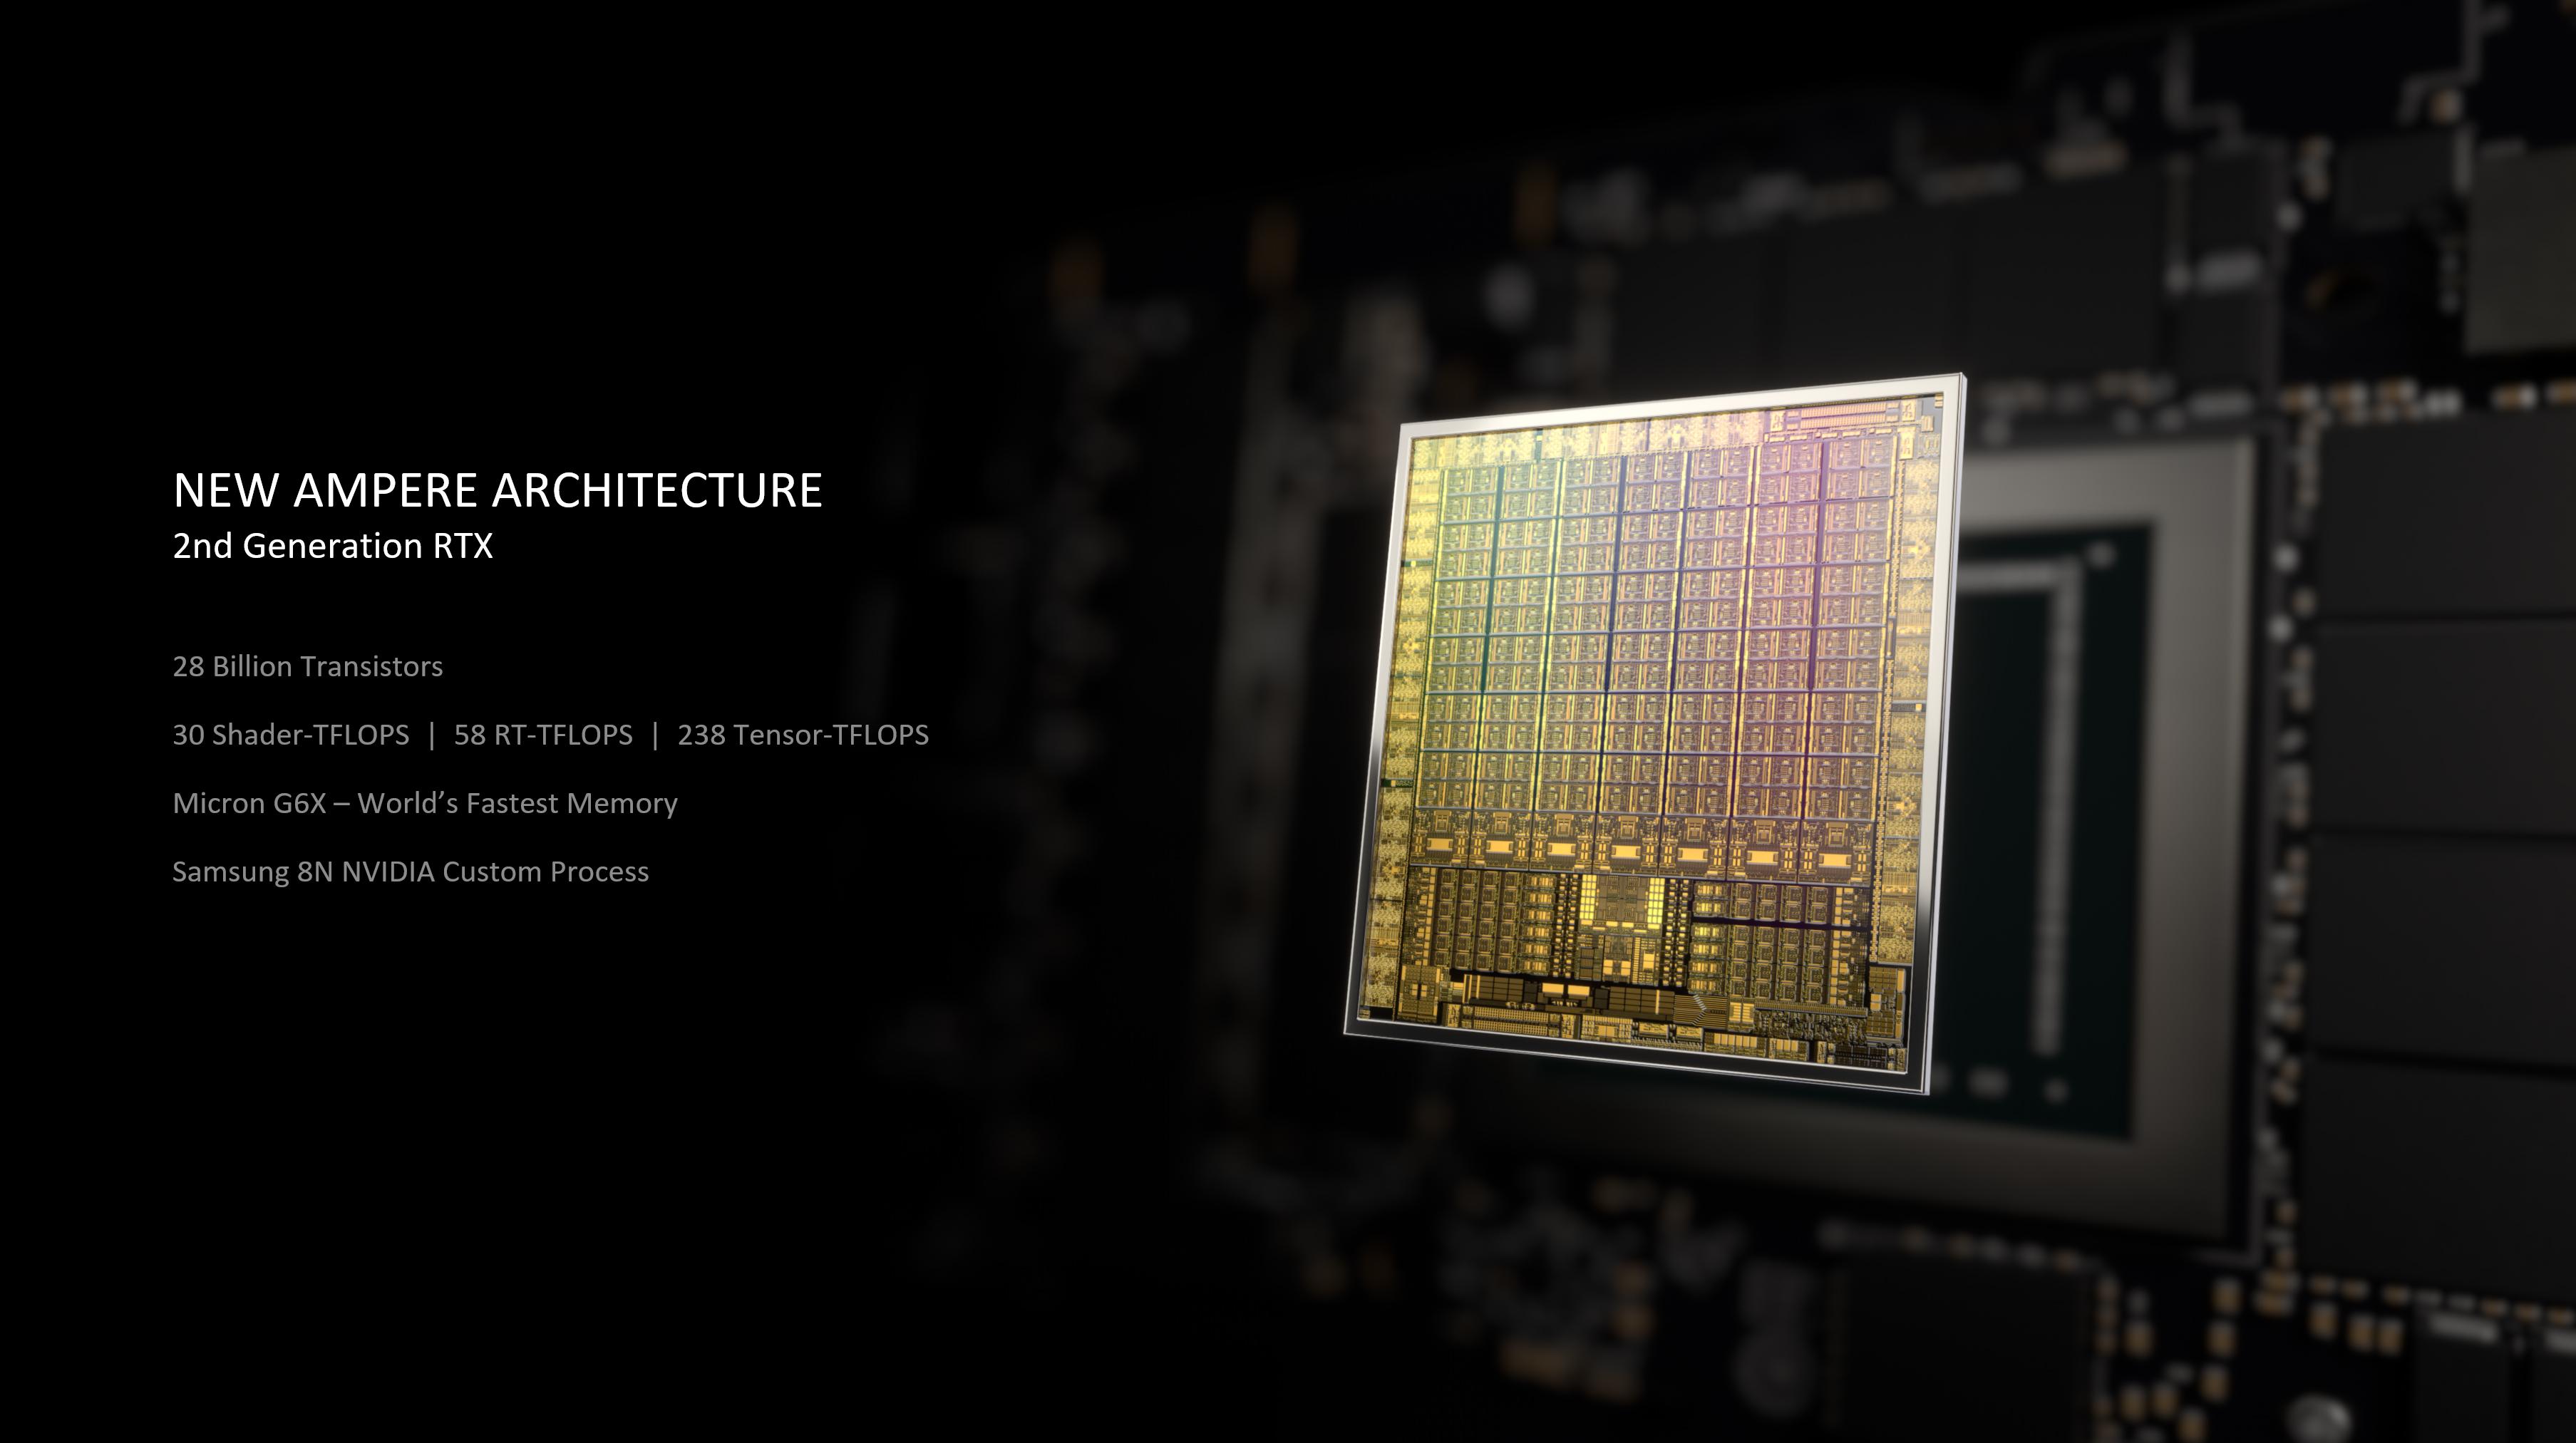 Media asset in full size related to 3dfxzone.it news item entitled as follows: In arrivo la GeForce RTX 3060 Ti per rispondere alle Radeon con GPU Big Navi | Image Name: news31164_NVIDIA-GPU-Ampere_1.jpg